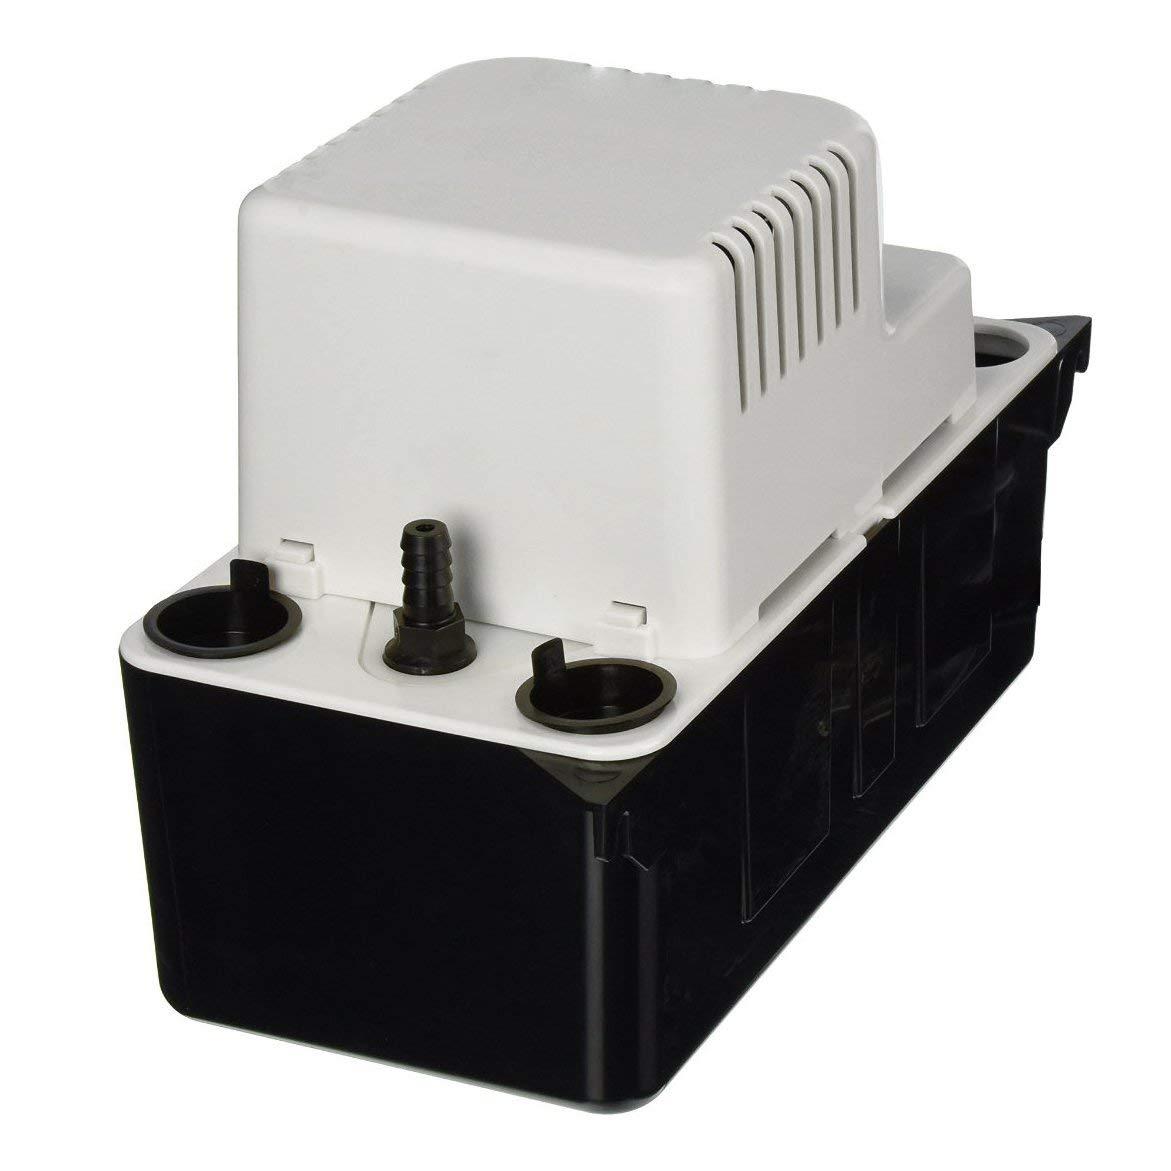 Little Giant VCMA-20UL 115V 80 GPH Vertical Centrifugal Condensate Pump (2 Pack)